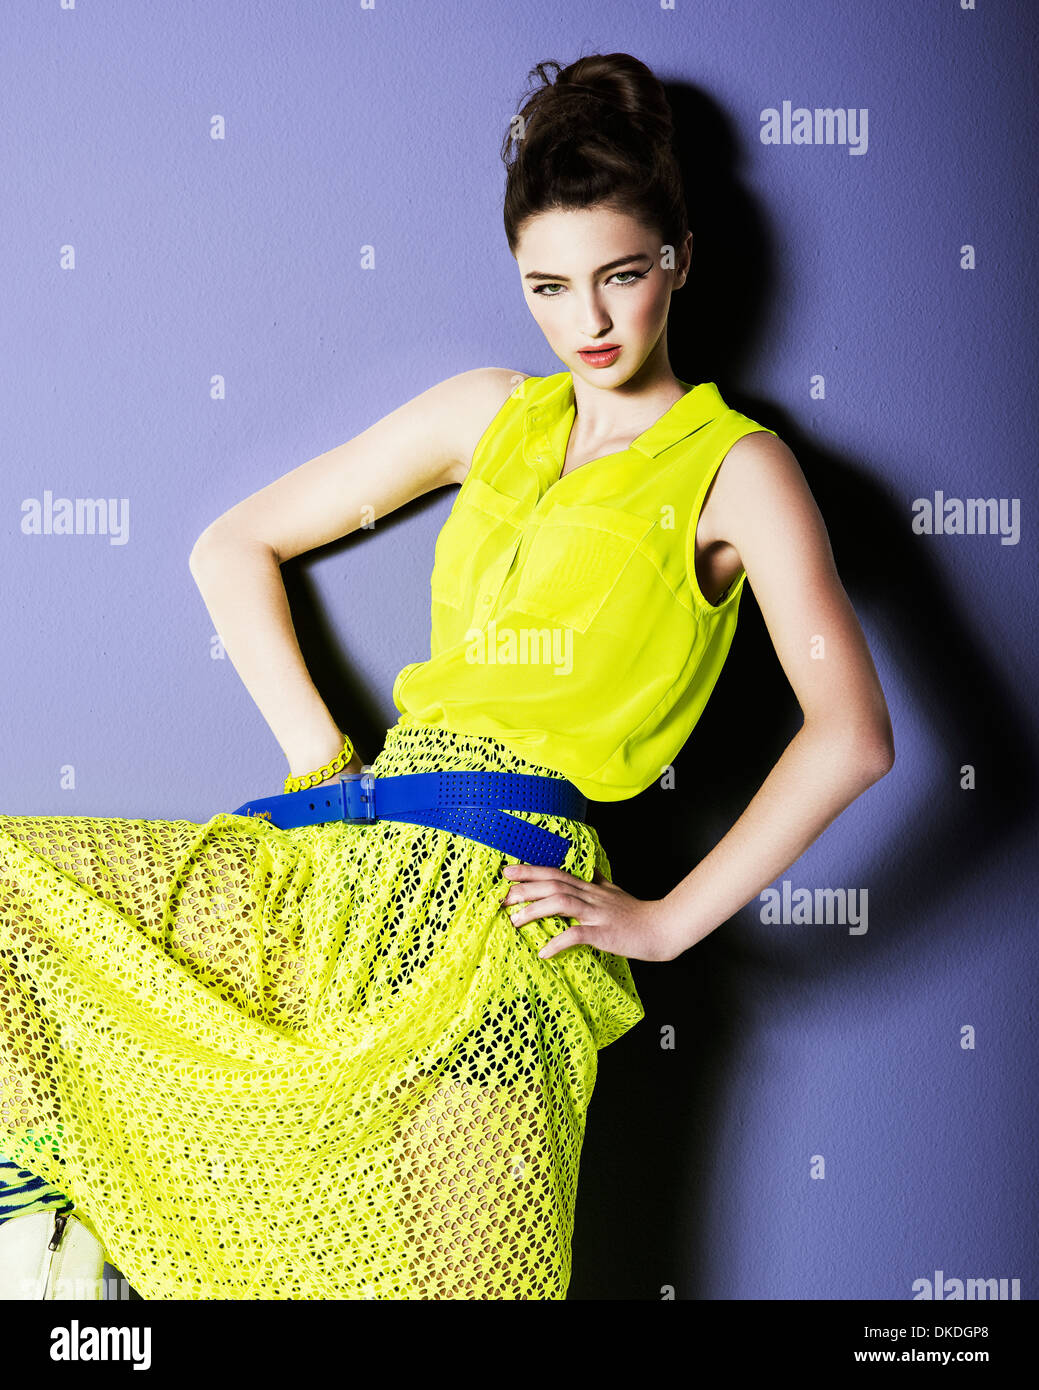 Jeune adolescent posant dans une robe jaune Photo Stock